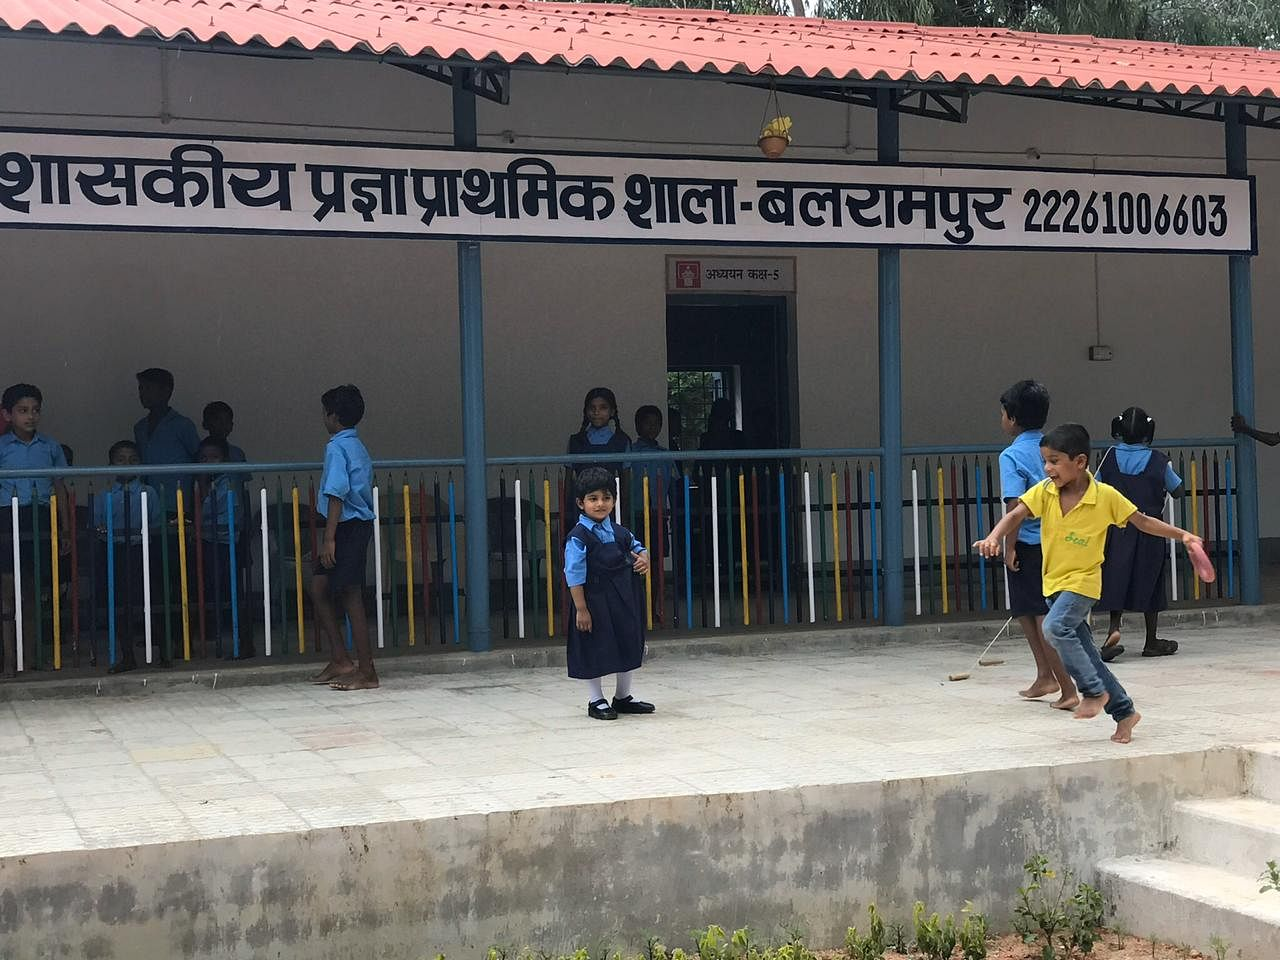 Young Vedika going to school in Balrampur district. (Source: Awanish Sharan)